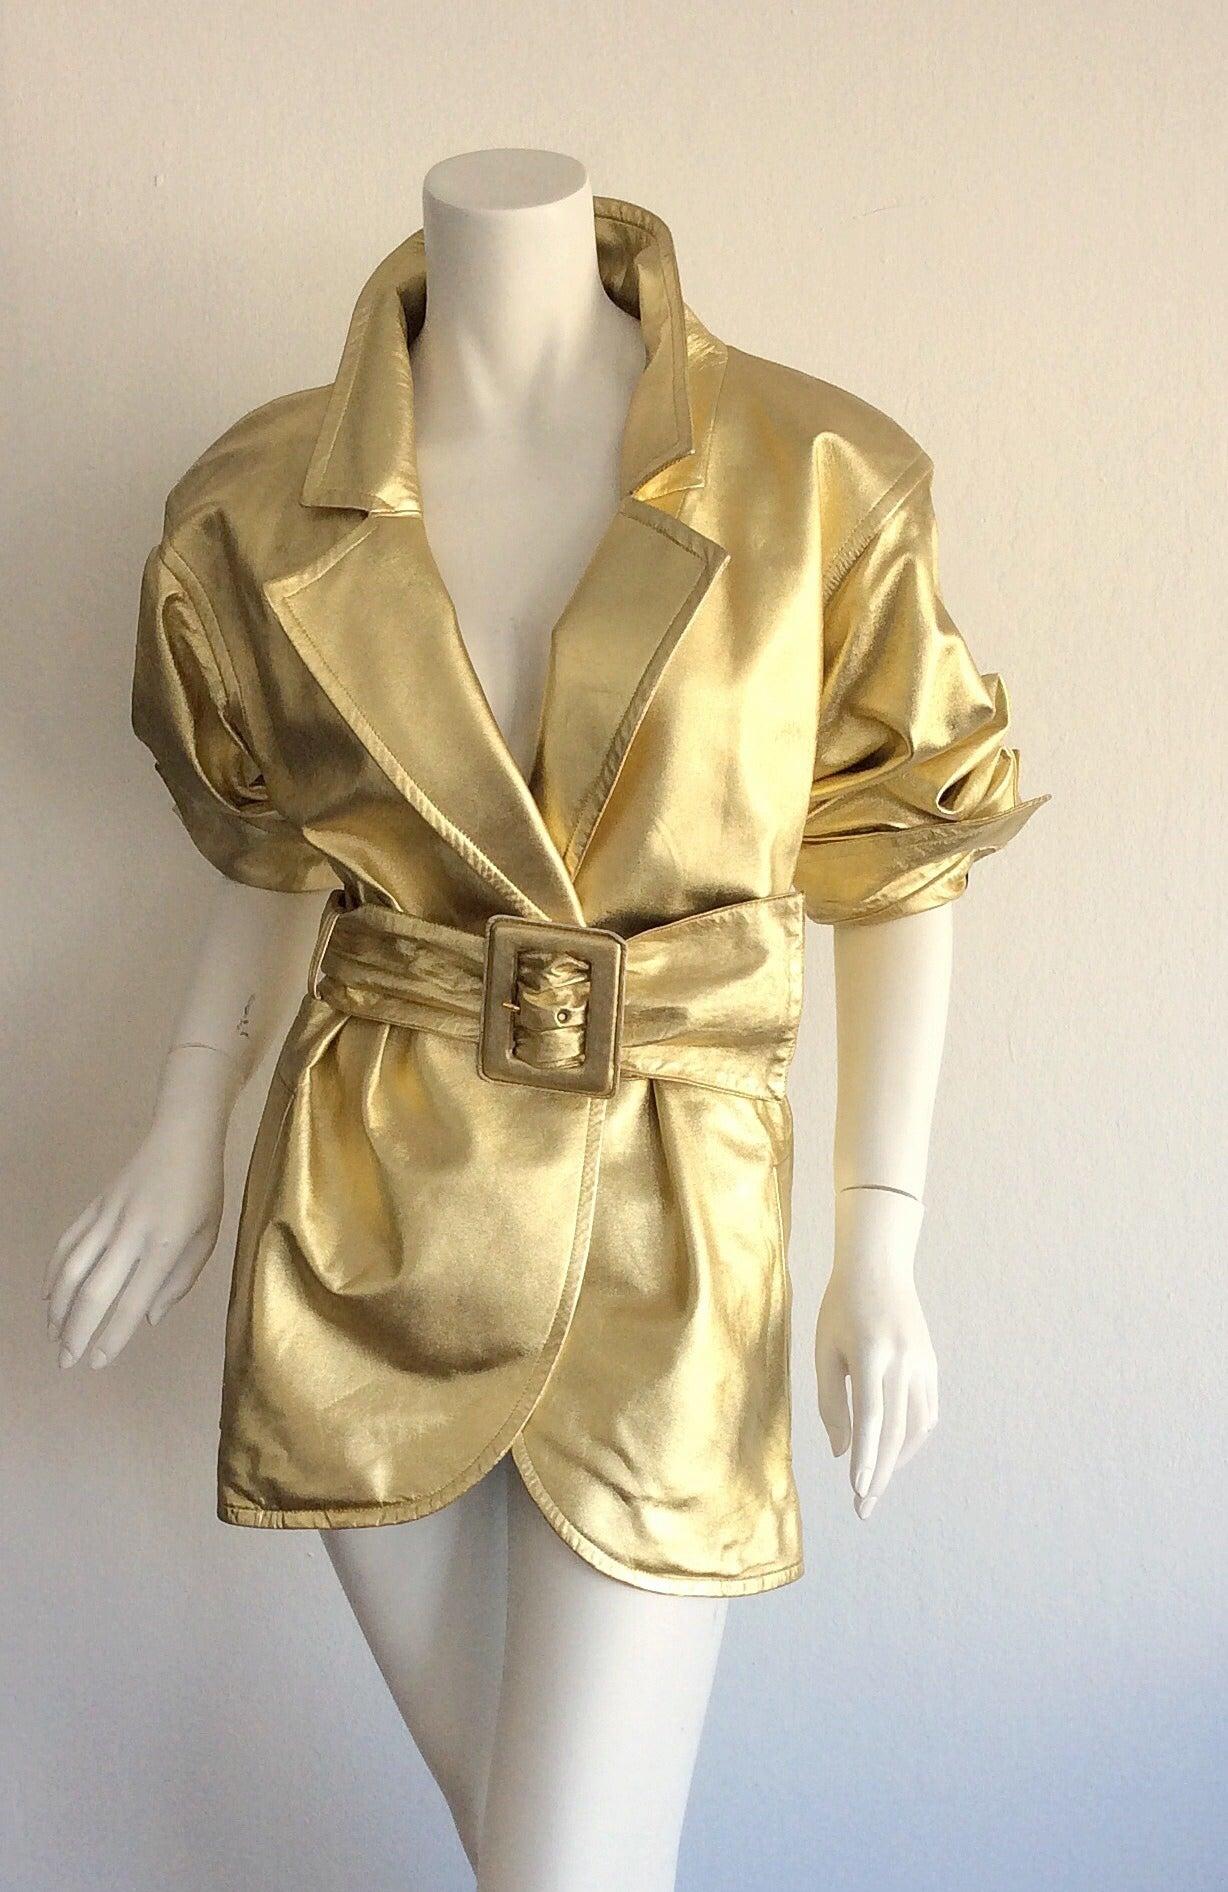 Vintage Yves Saint Laurent ' Rive Gauche ' Belted Gold Leather Jacket 2